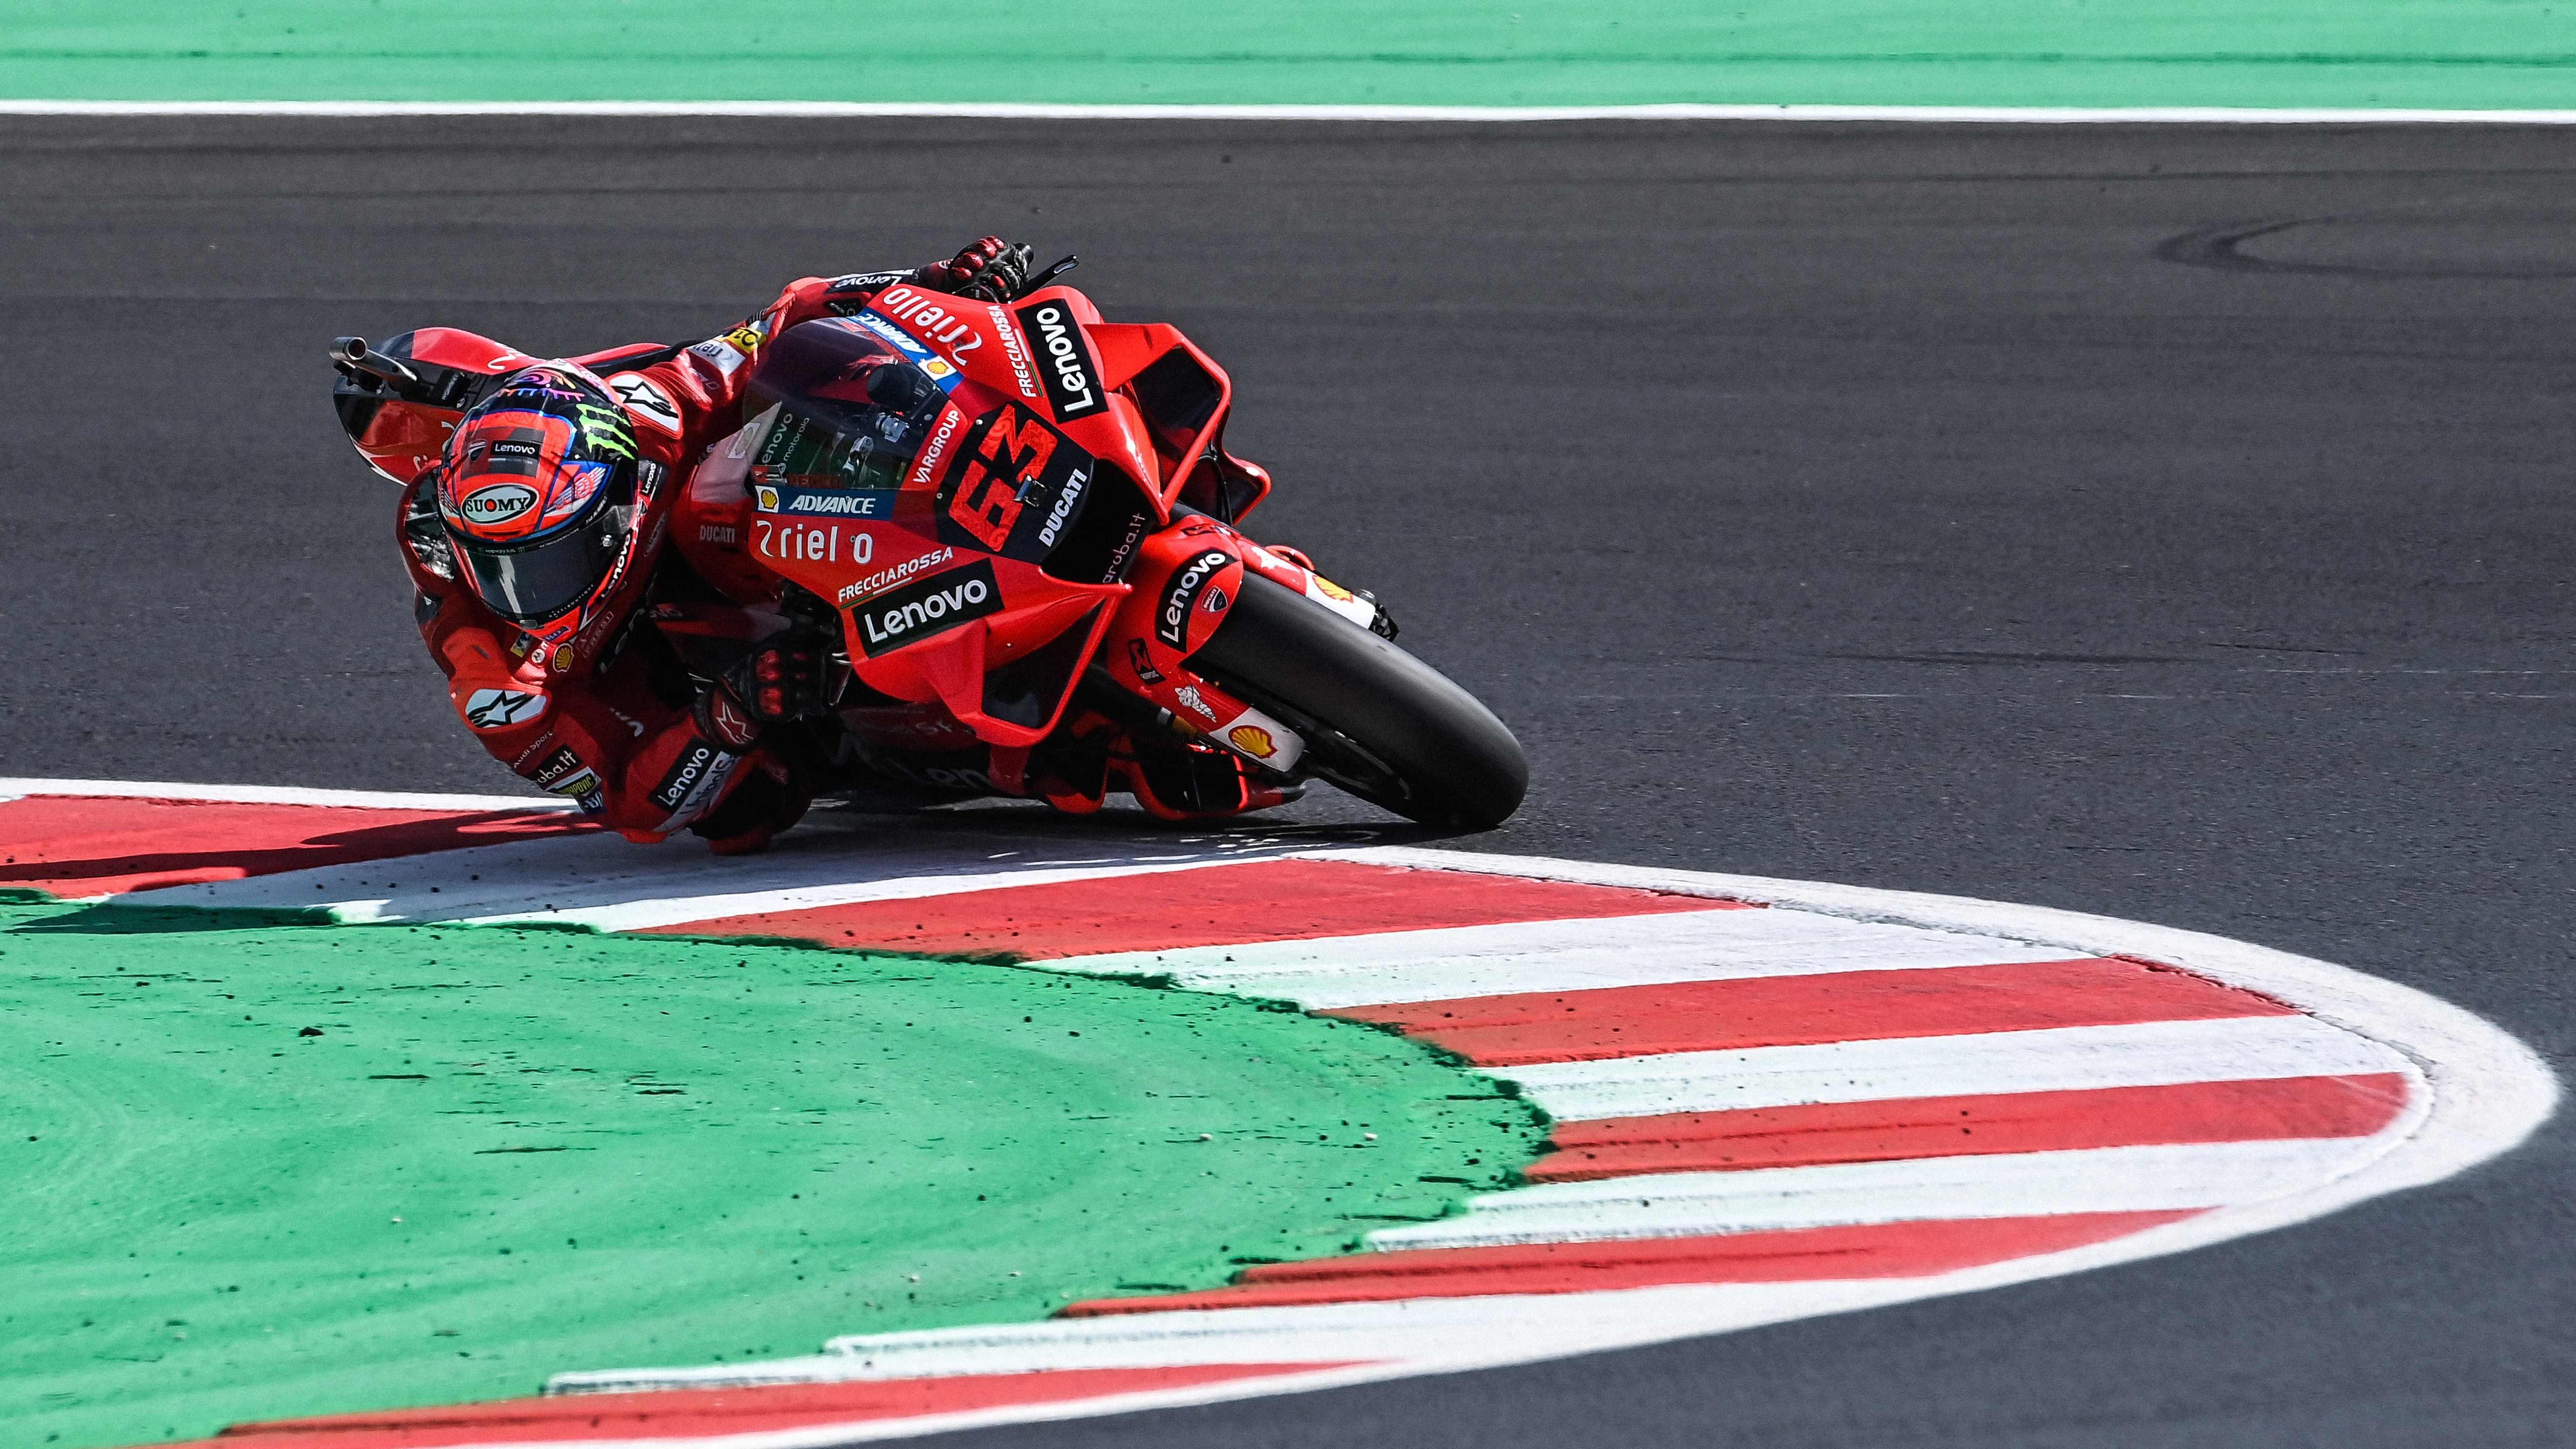 Pecco Bagnaia vuela en Misano, un circuito conquistado por Ducati